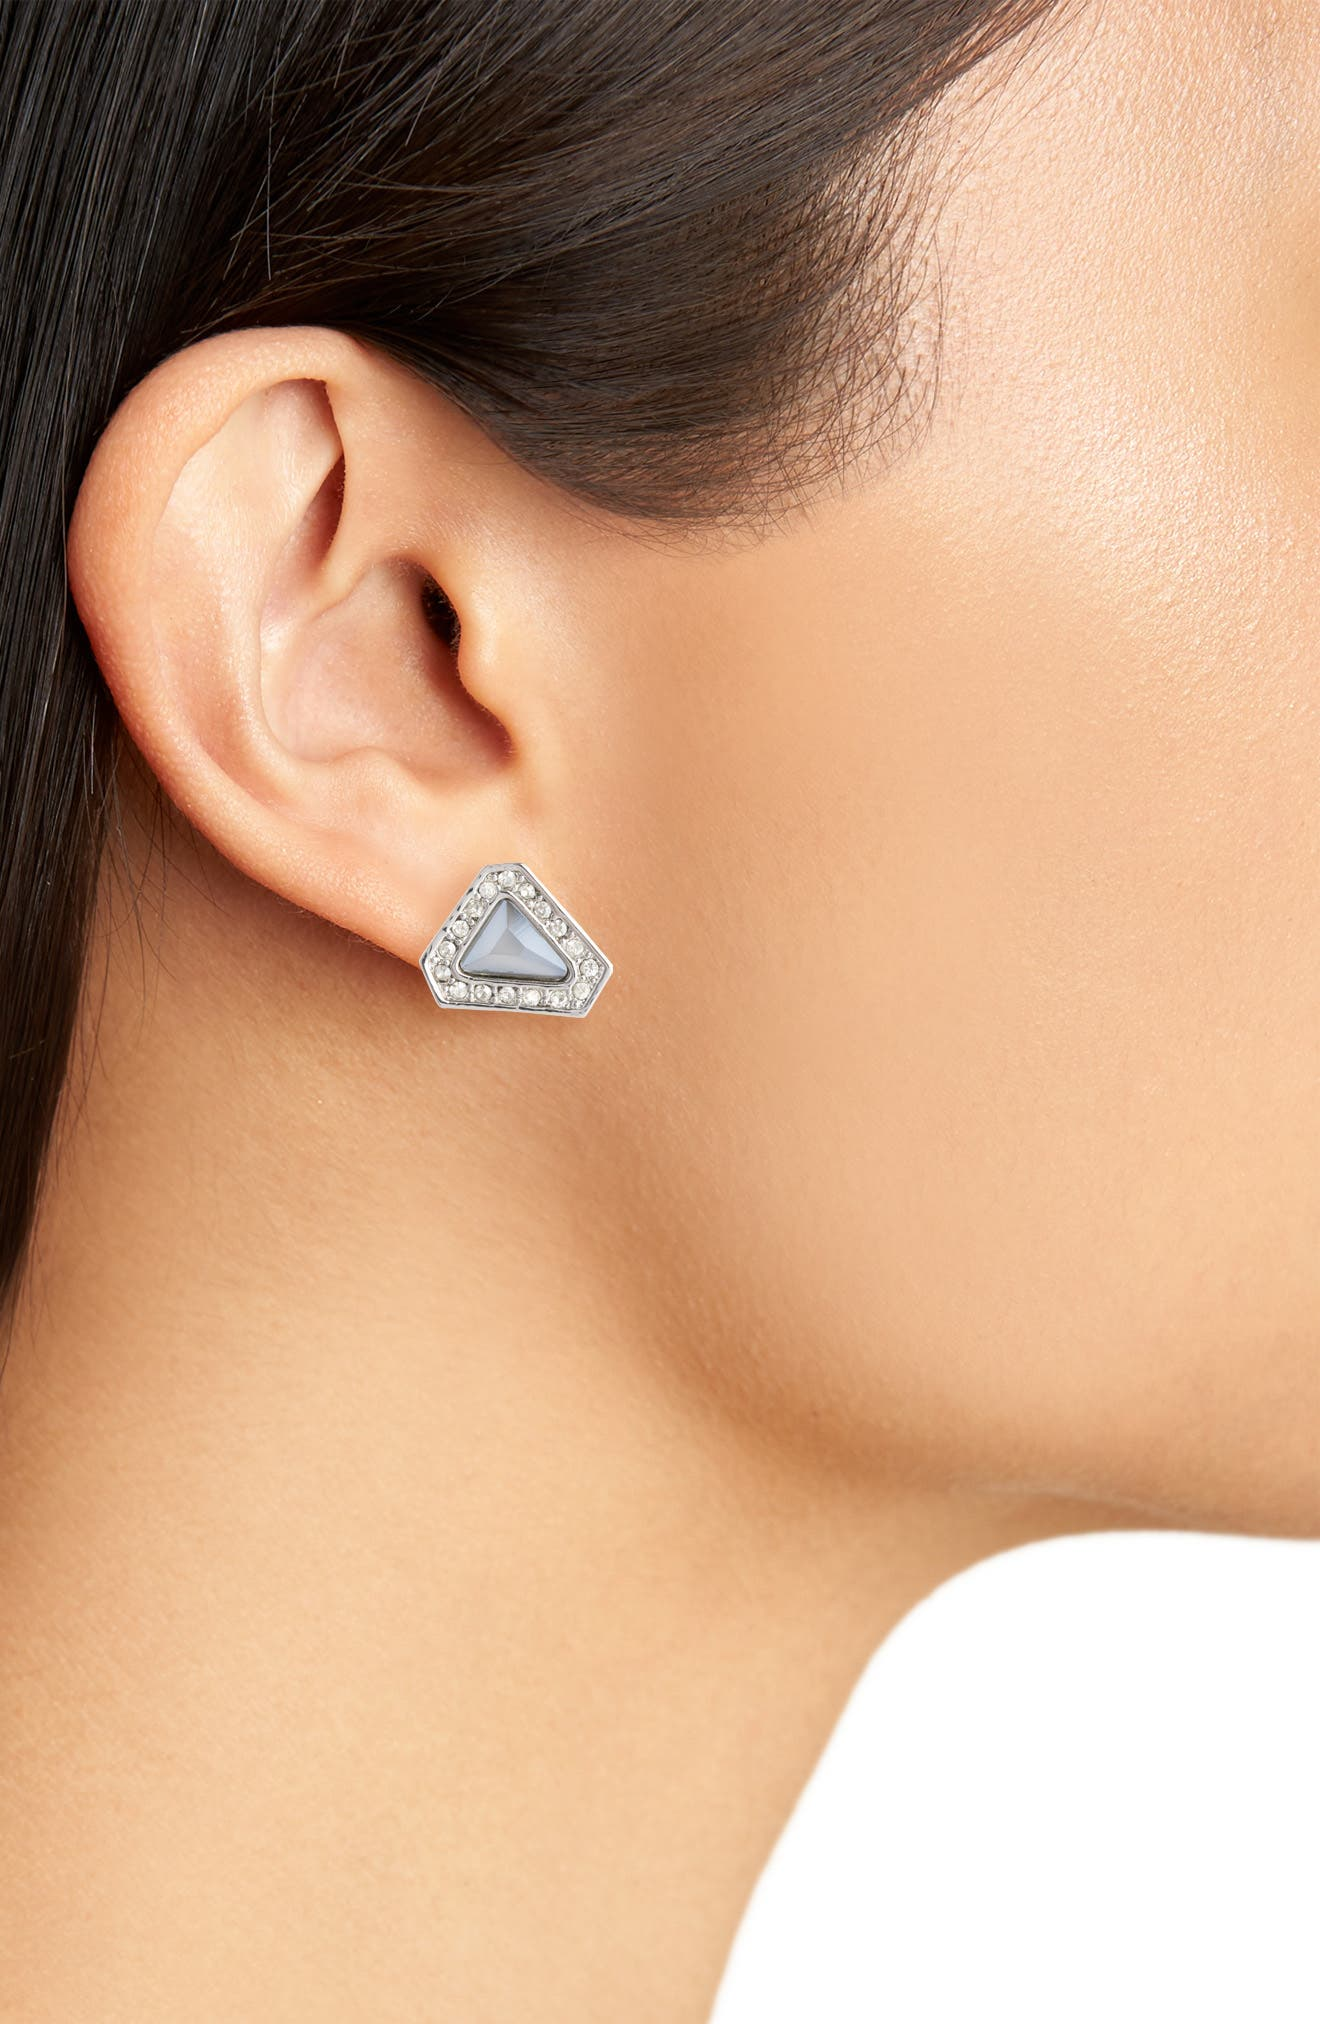 Swarovski Crystal Stud Earrings,                             Alternate thumbnail 2, color,                             020